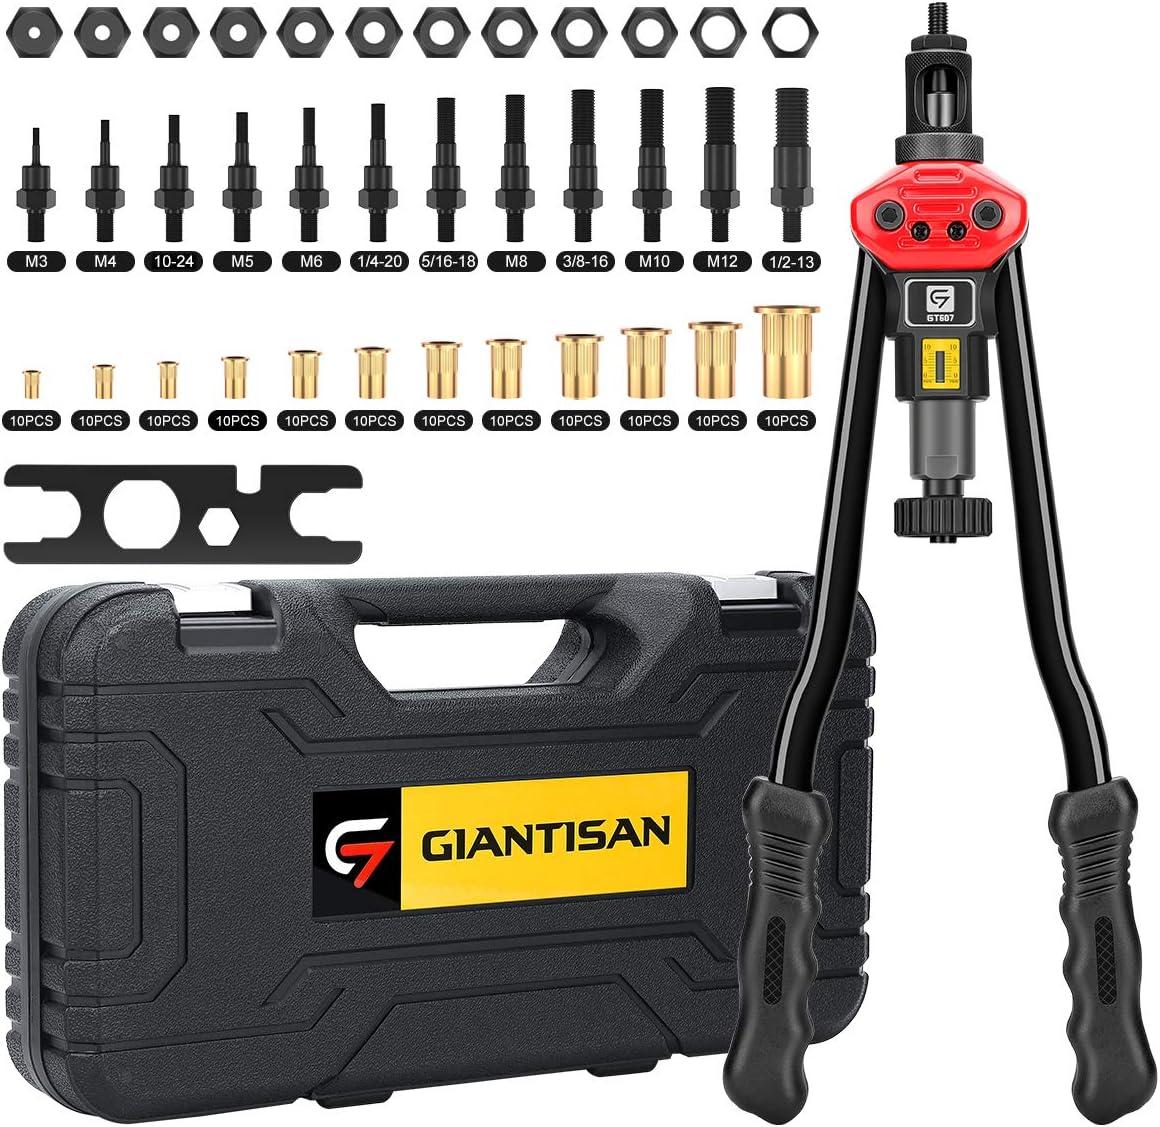 "Giantisan 16"" Rivet Nut Tool, Professional Rivet Nut Tool Setter Kit Including 12 Metric and SAE Mandrels, 120Pcs Assorted Rivet Nuts, Effortless Design, Rugged Carrying Case"